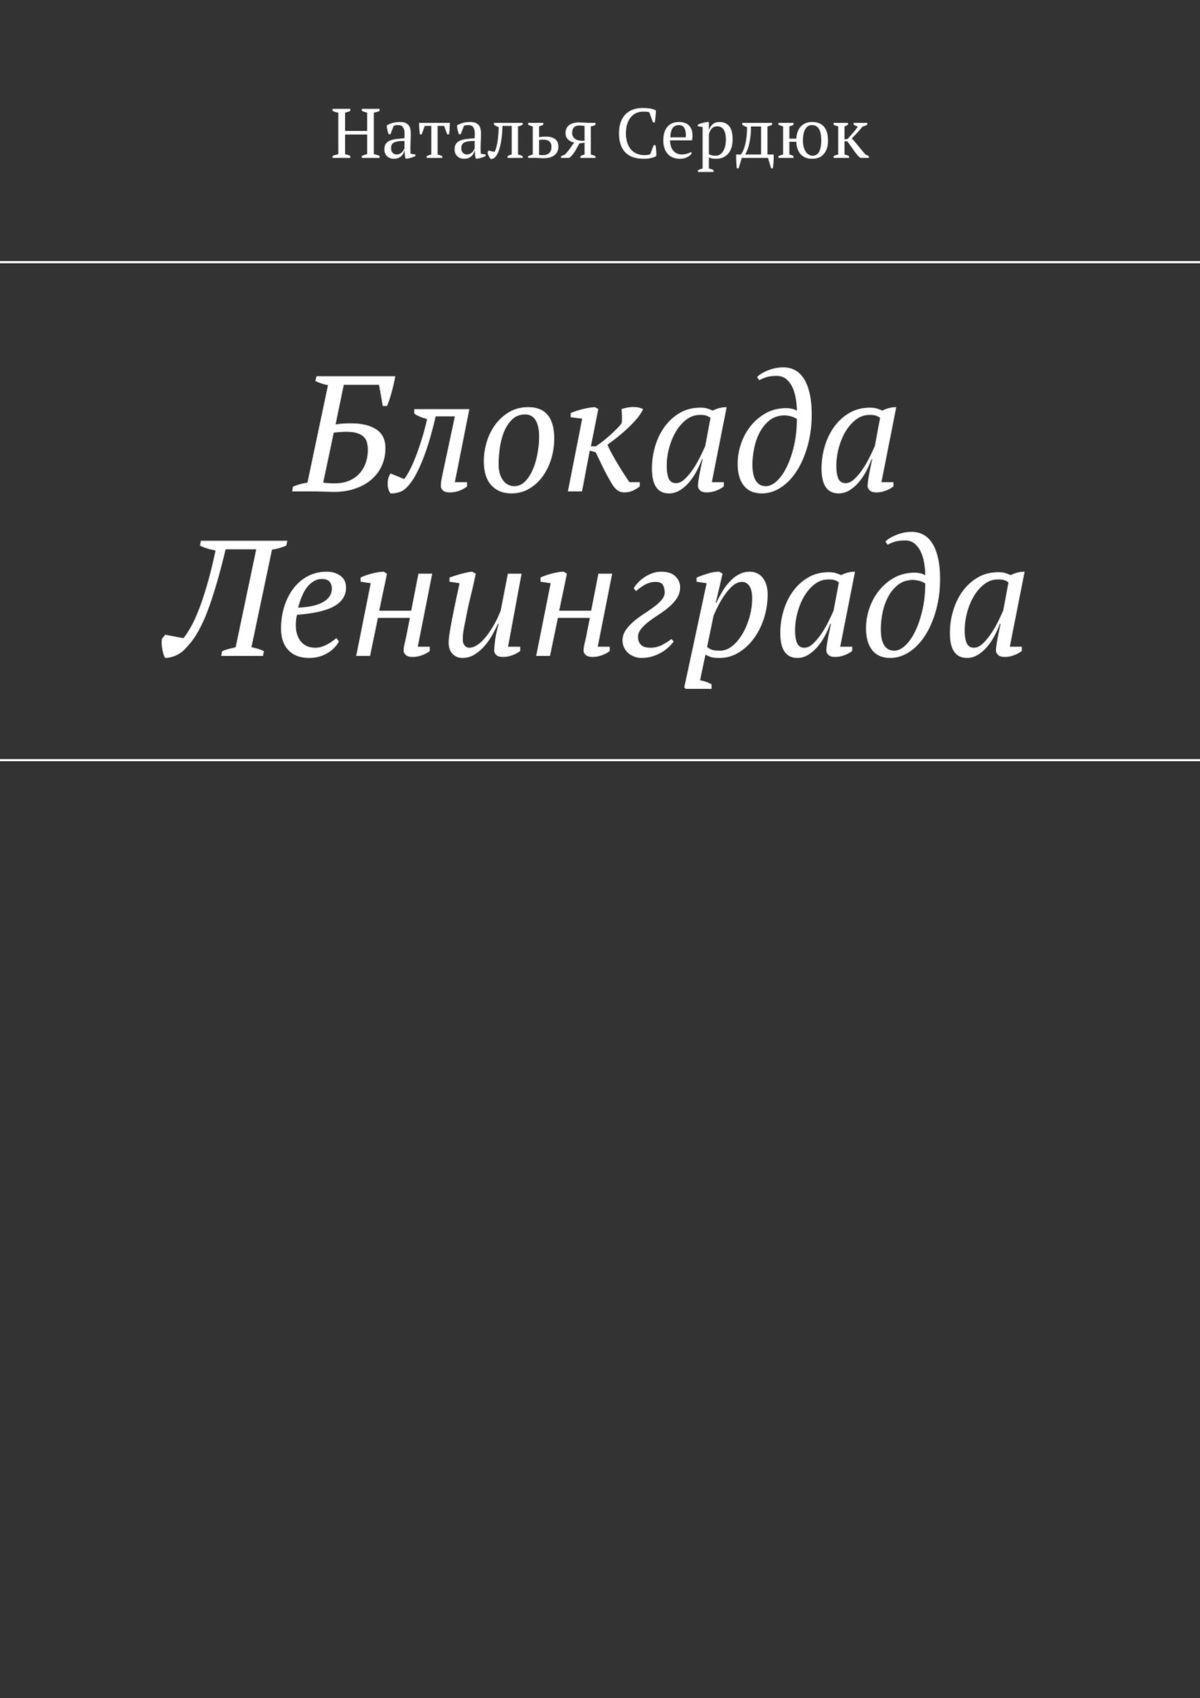 Наталья Сердюк - Блокада Ленинграда